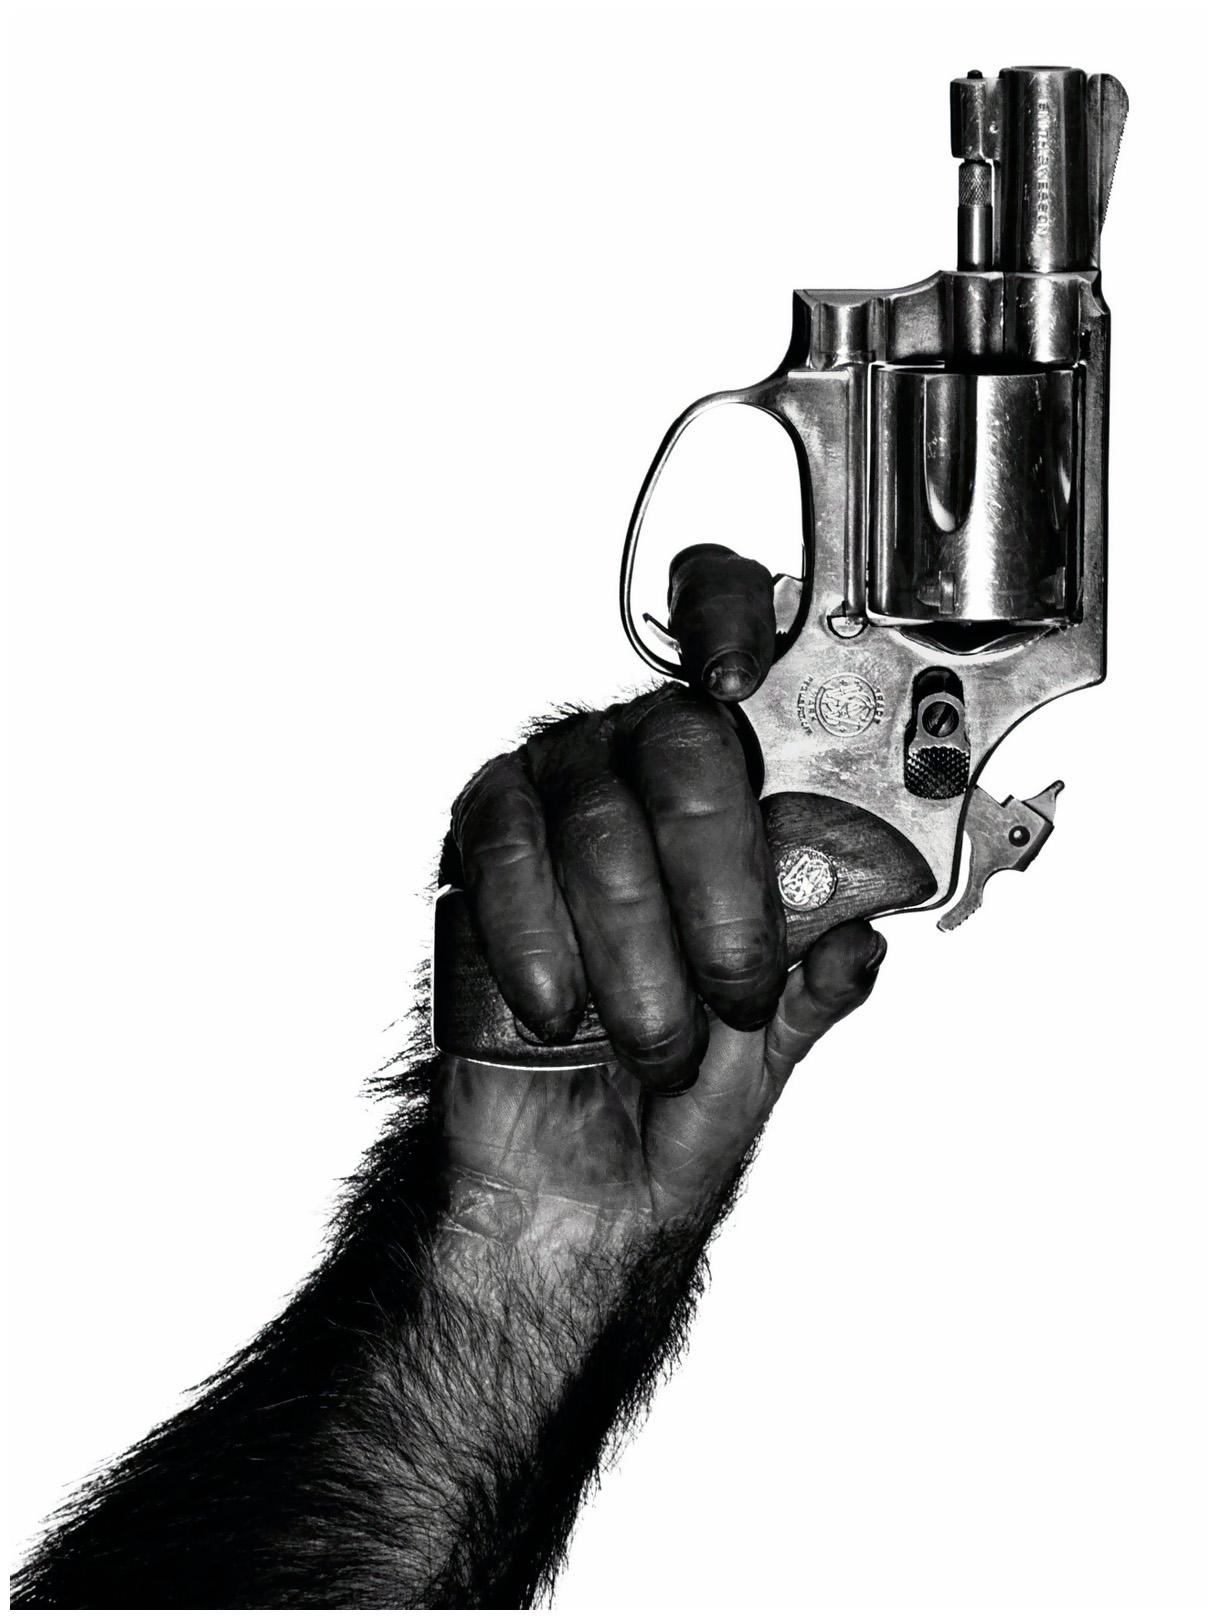 Monkey With Gun, New York, 1992 - Albert Watson